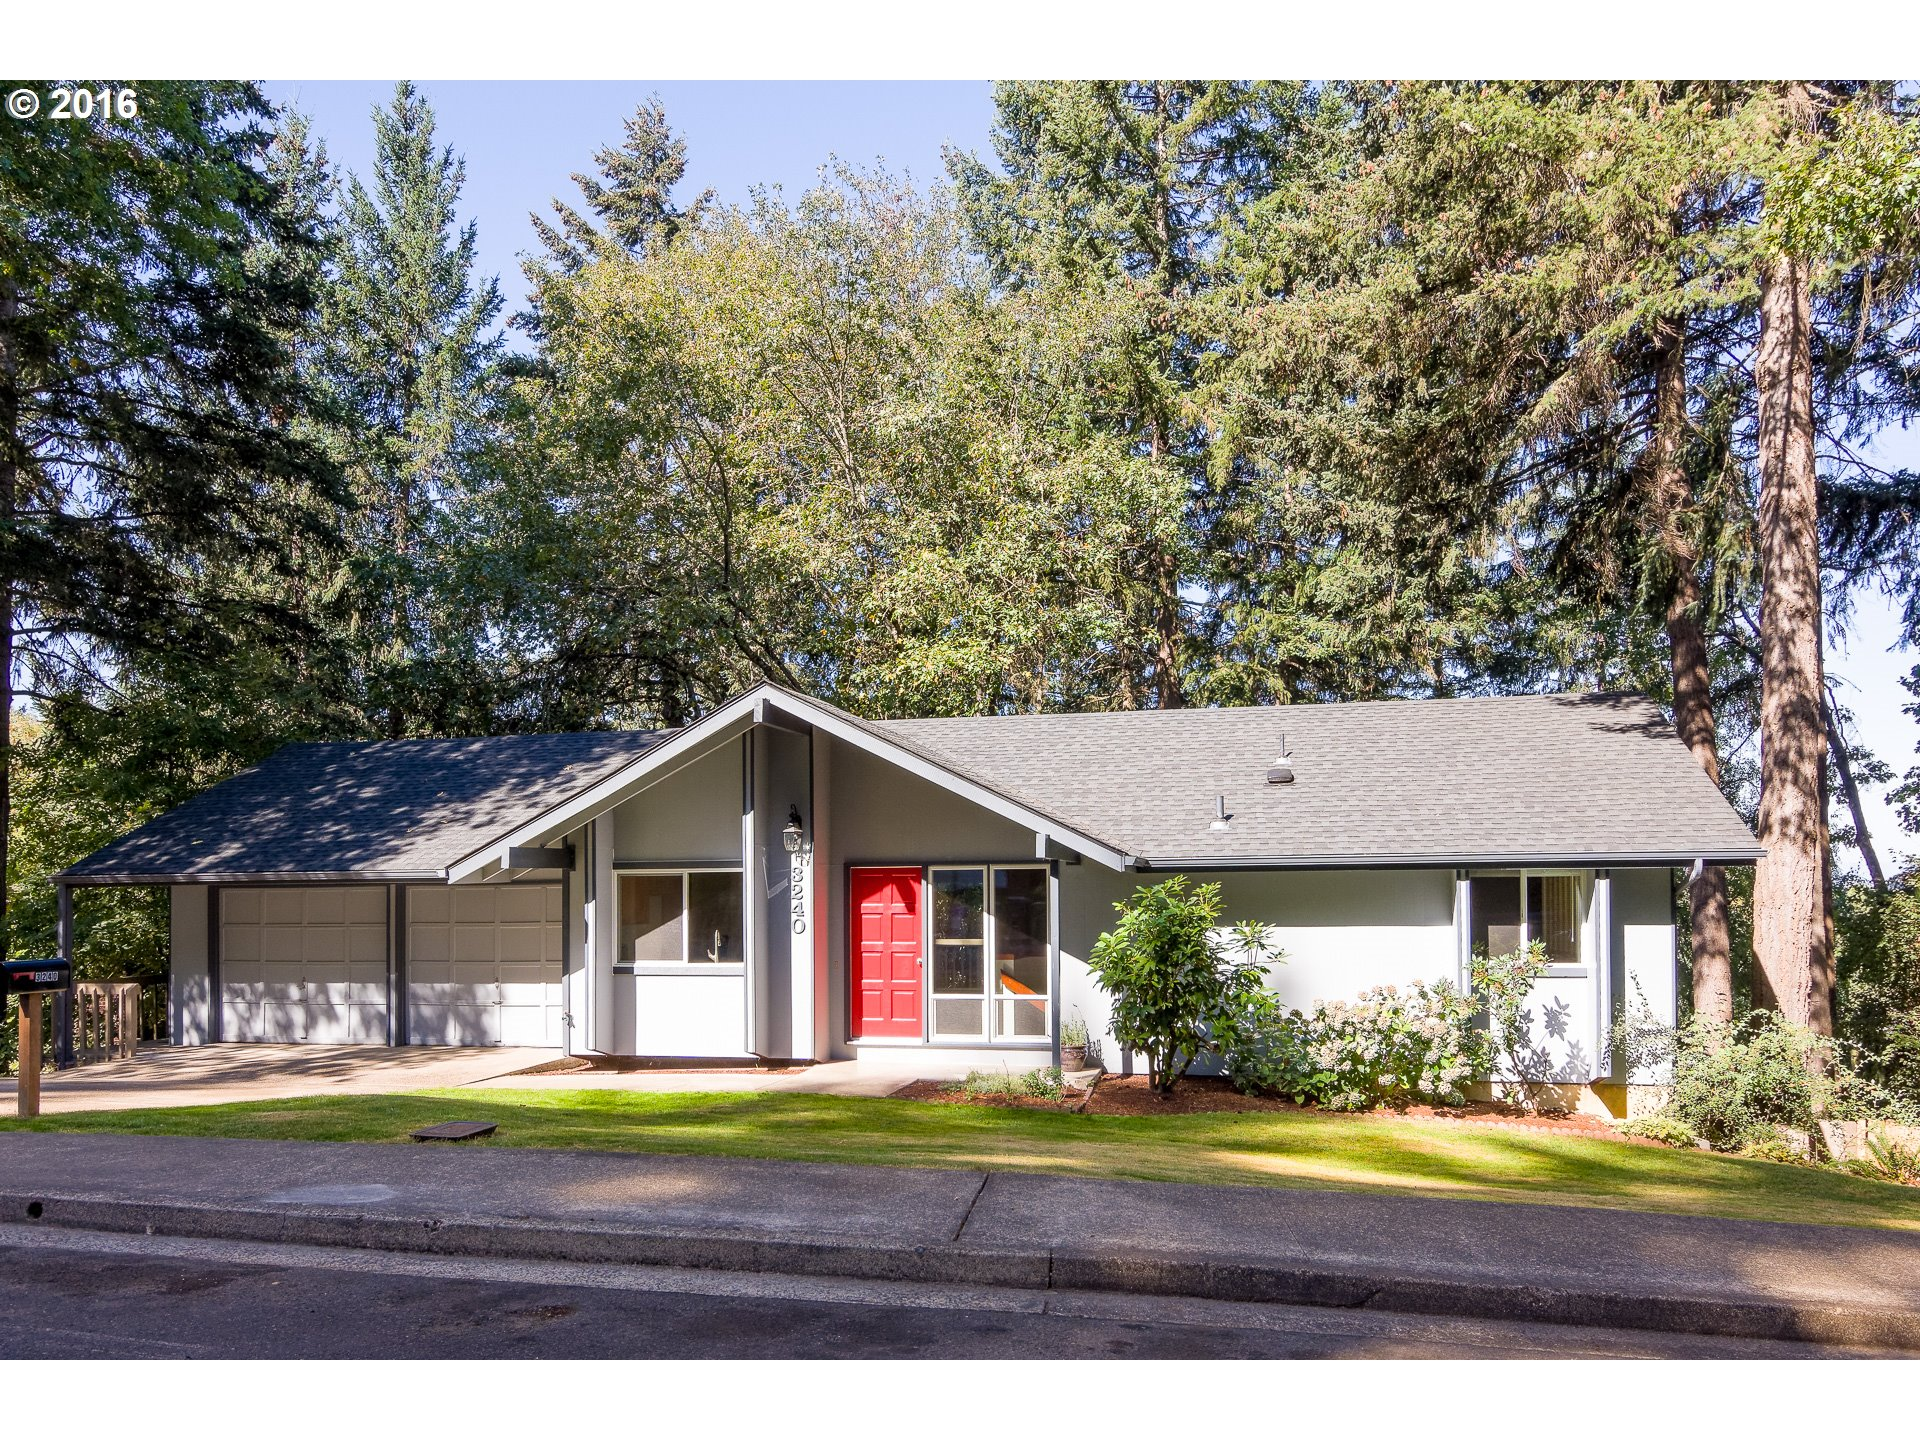 3240 KEVINGTON AVE, Eugene OR 97405